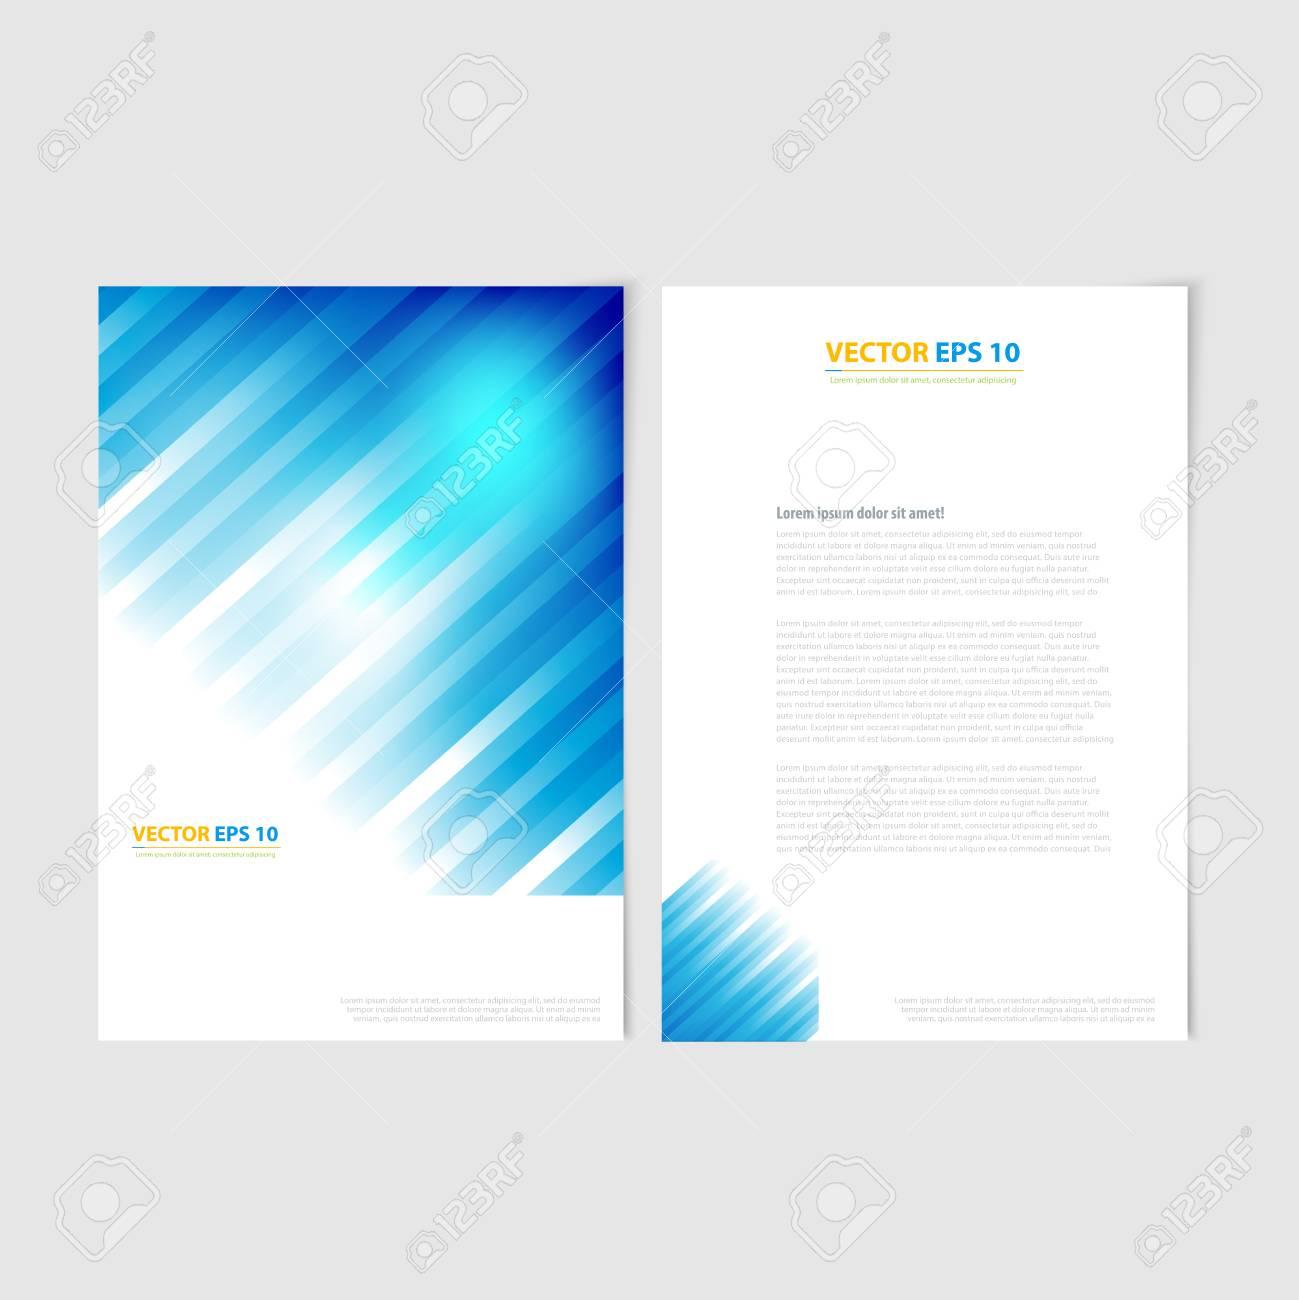 Azure Flyer Template   Flyer Template Back And Front Design Brochure Design Templates